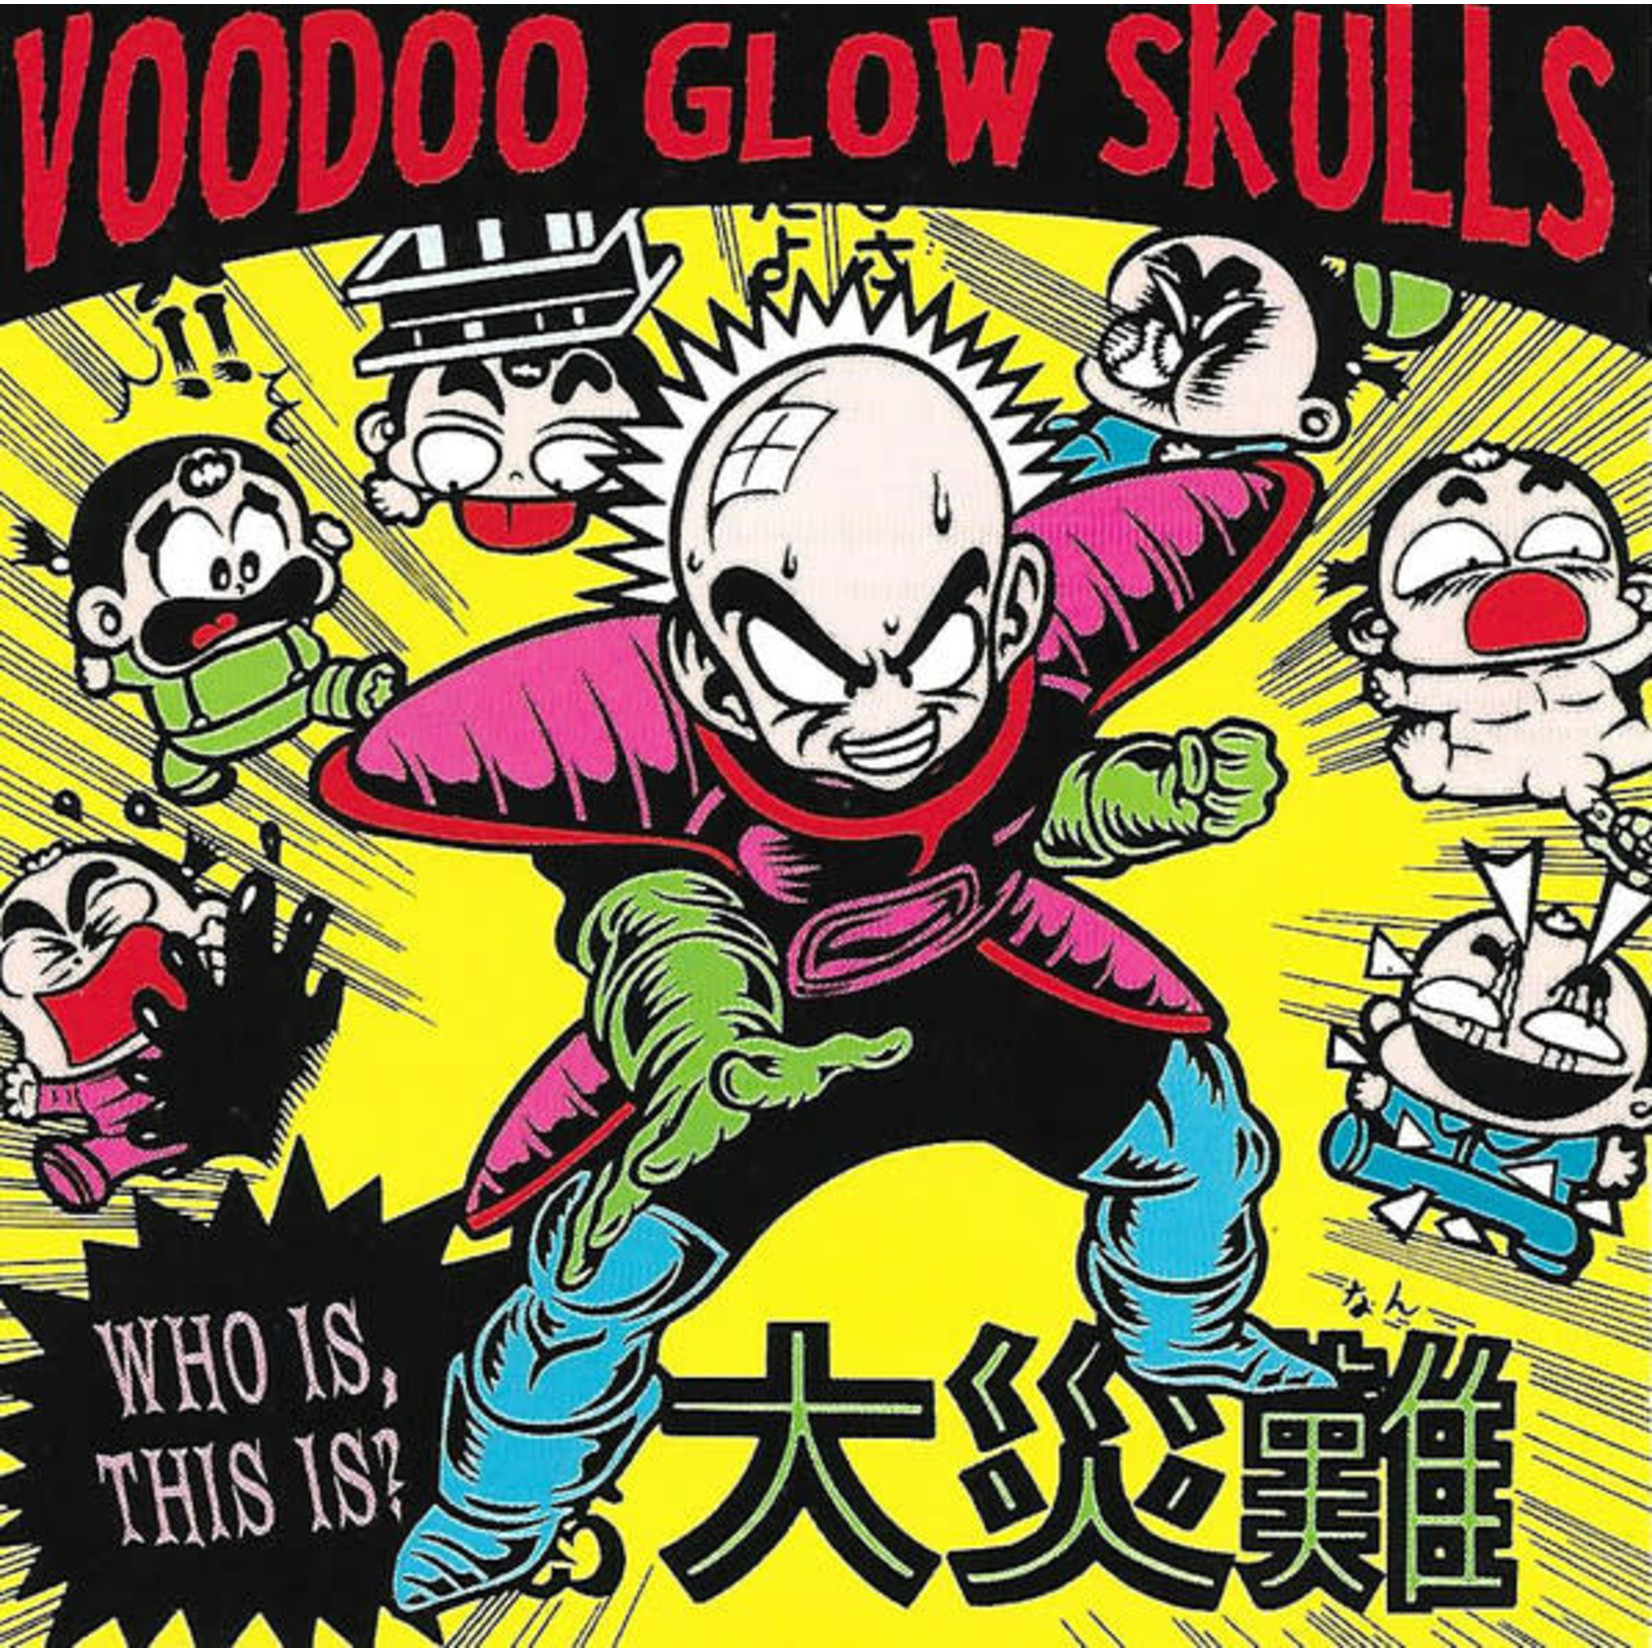 [New] Voodoo Glow Skulls: Who Is? This Is?